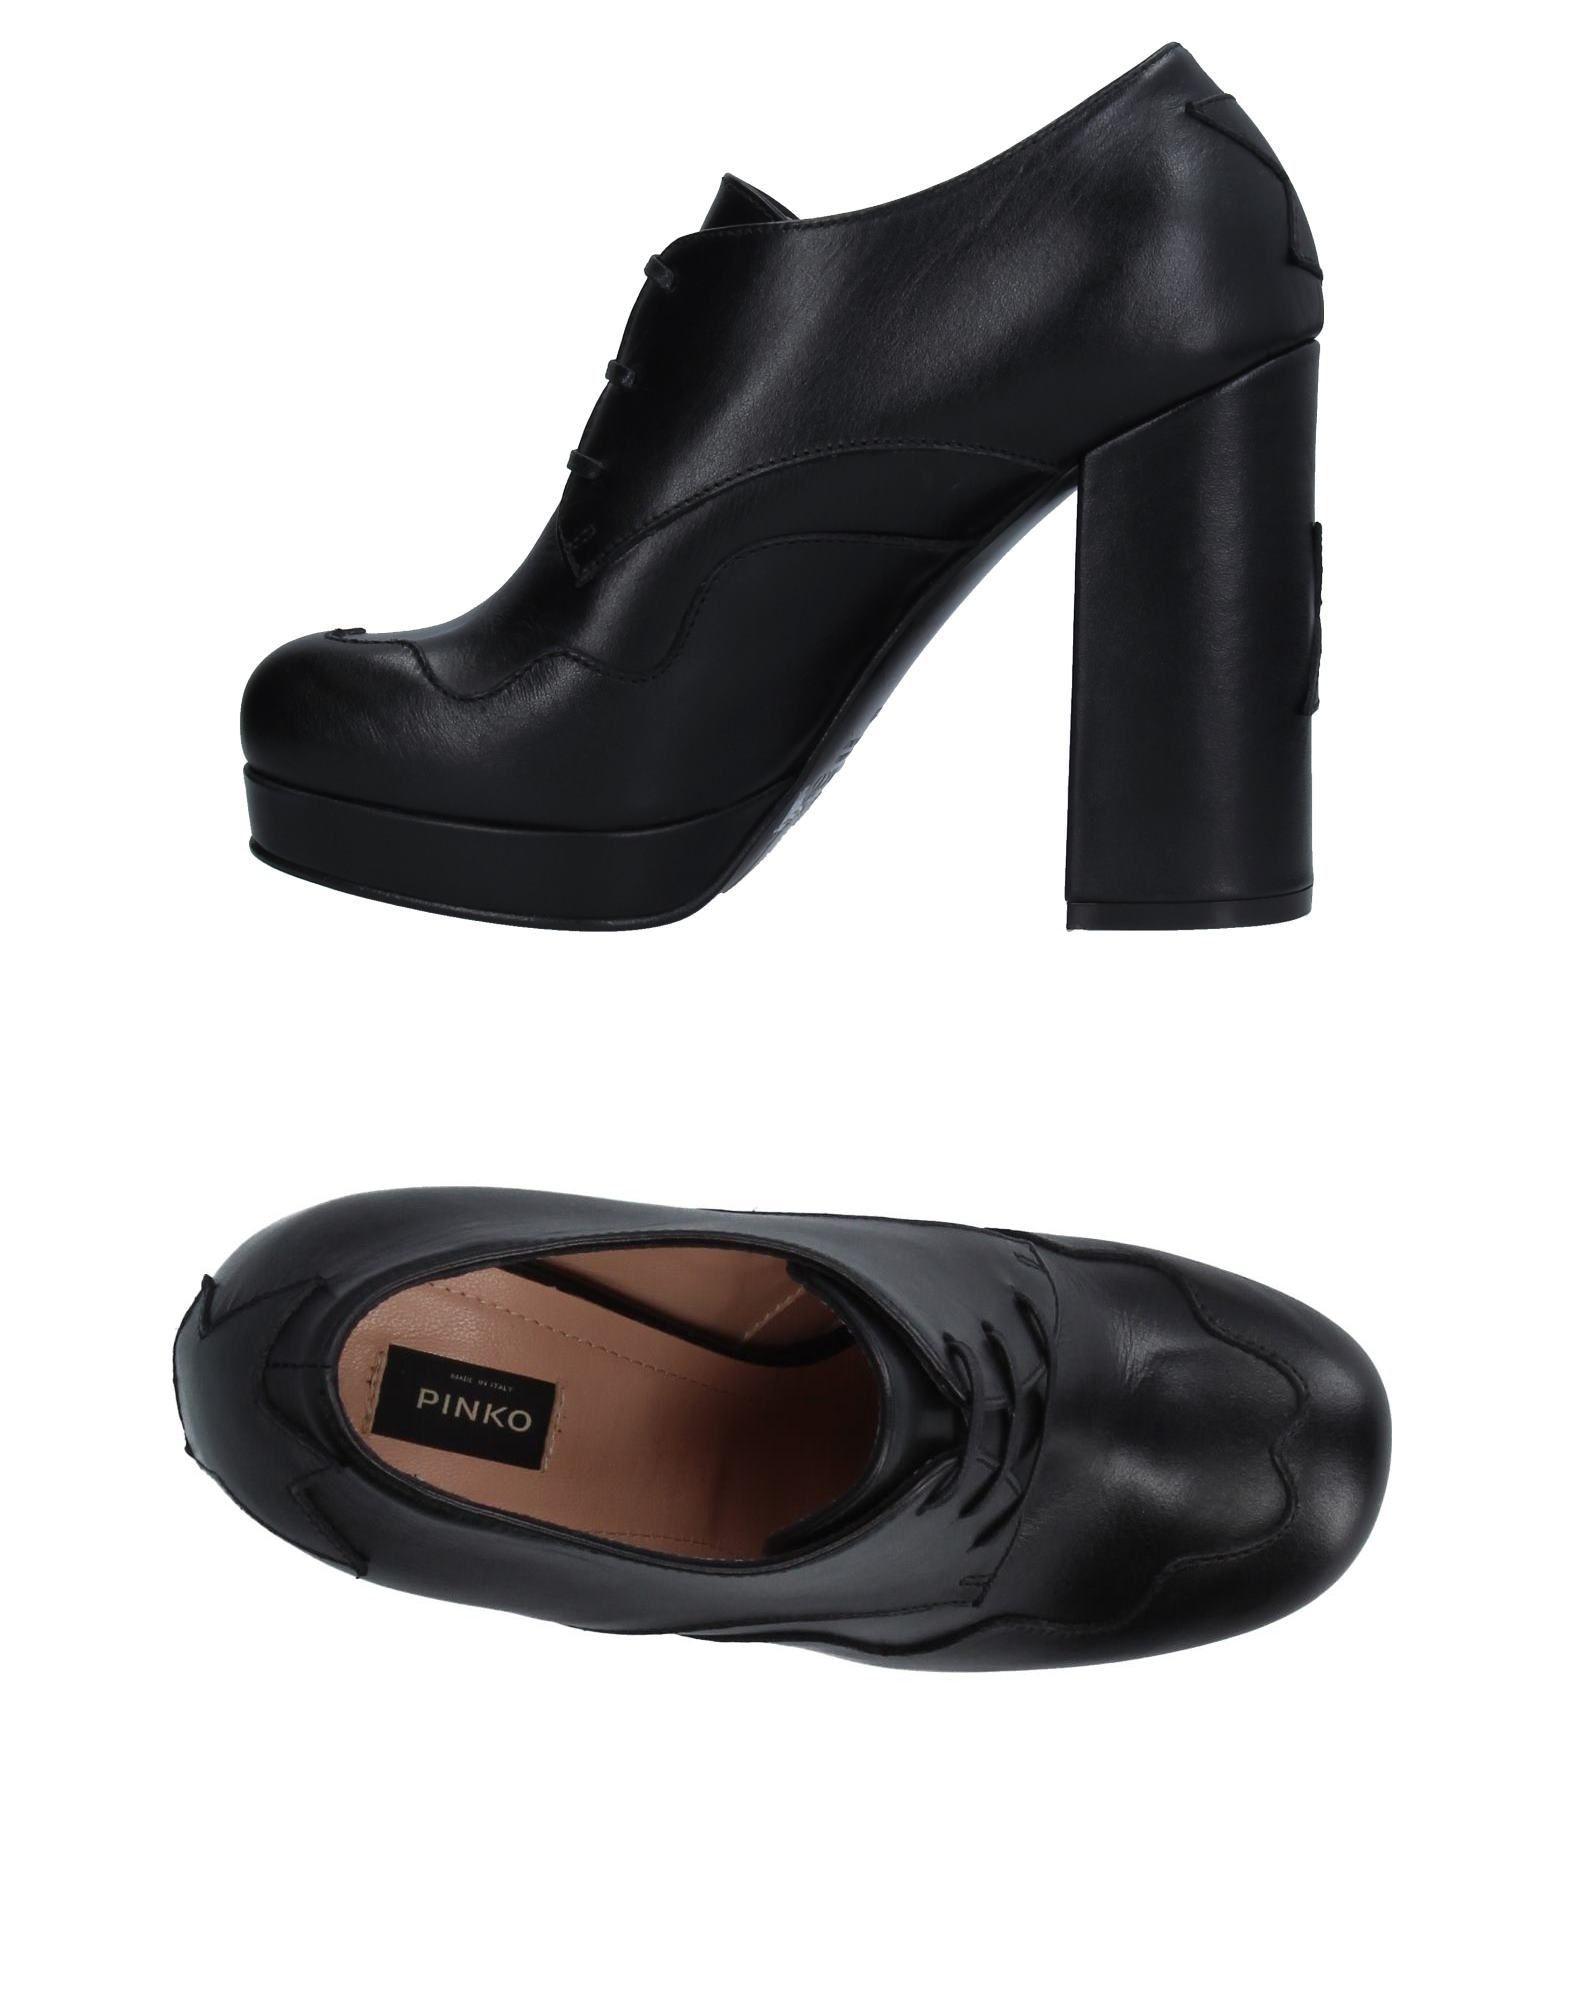 PINKO Обувь на шнурках сандалии ия 2017 круглый нос летняя обувь кожаная обувь обувь с пряжечной кожаная обувь